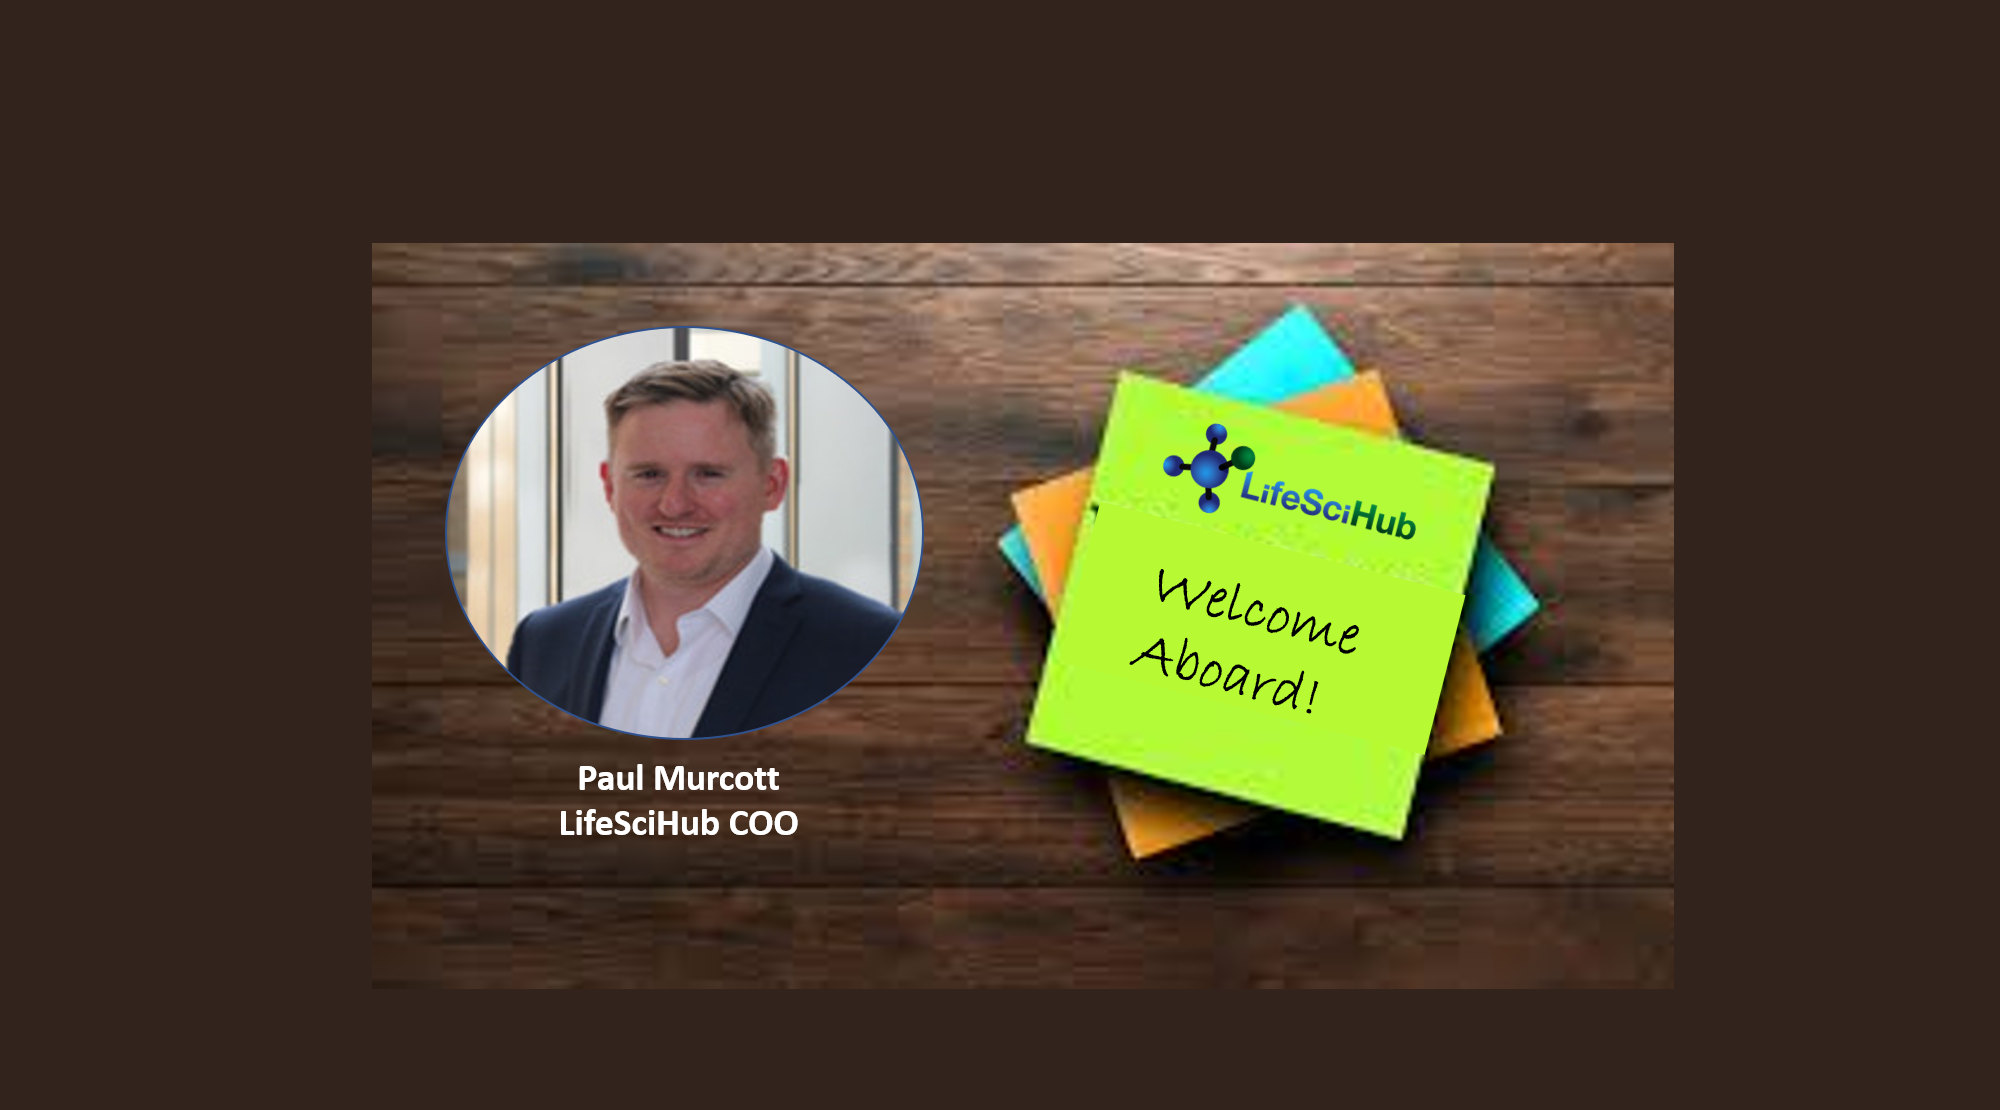 LifeSciHub Announces Partner and COO Paul Murcott